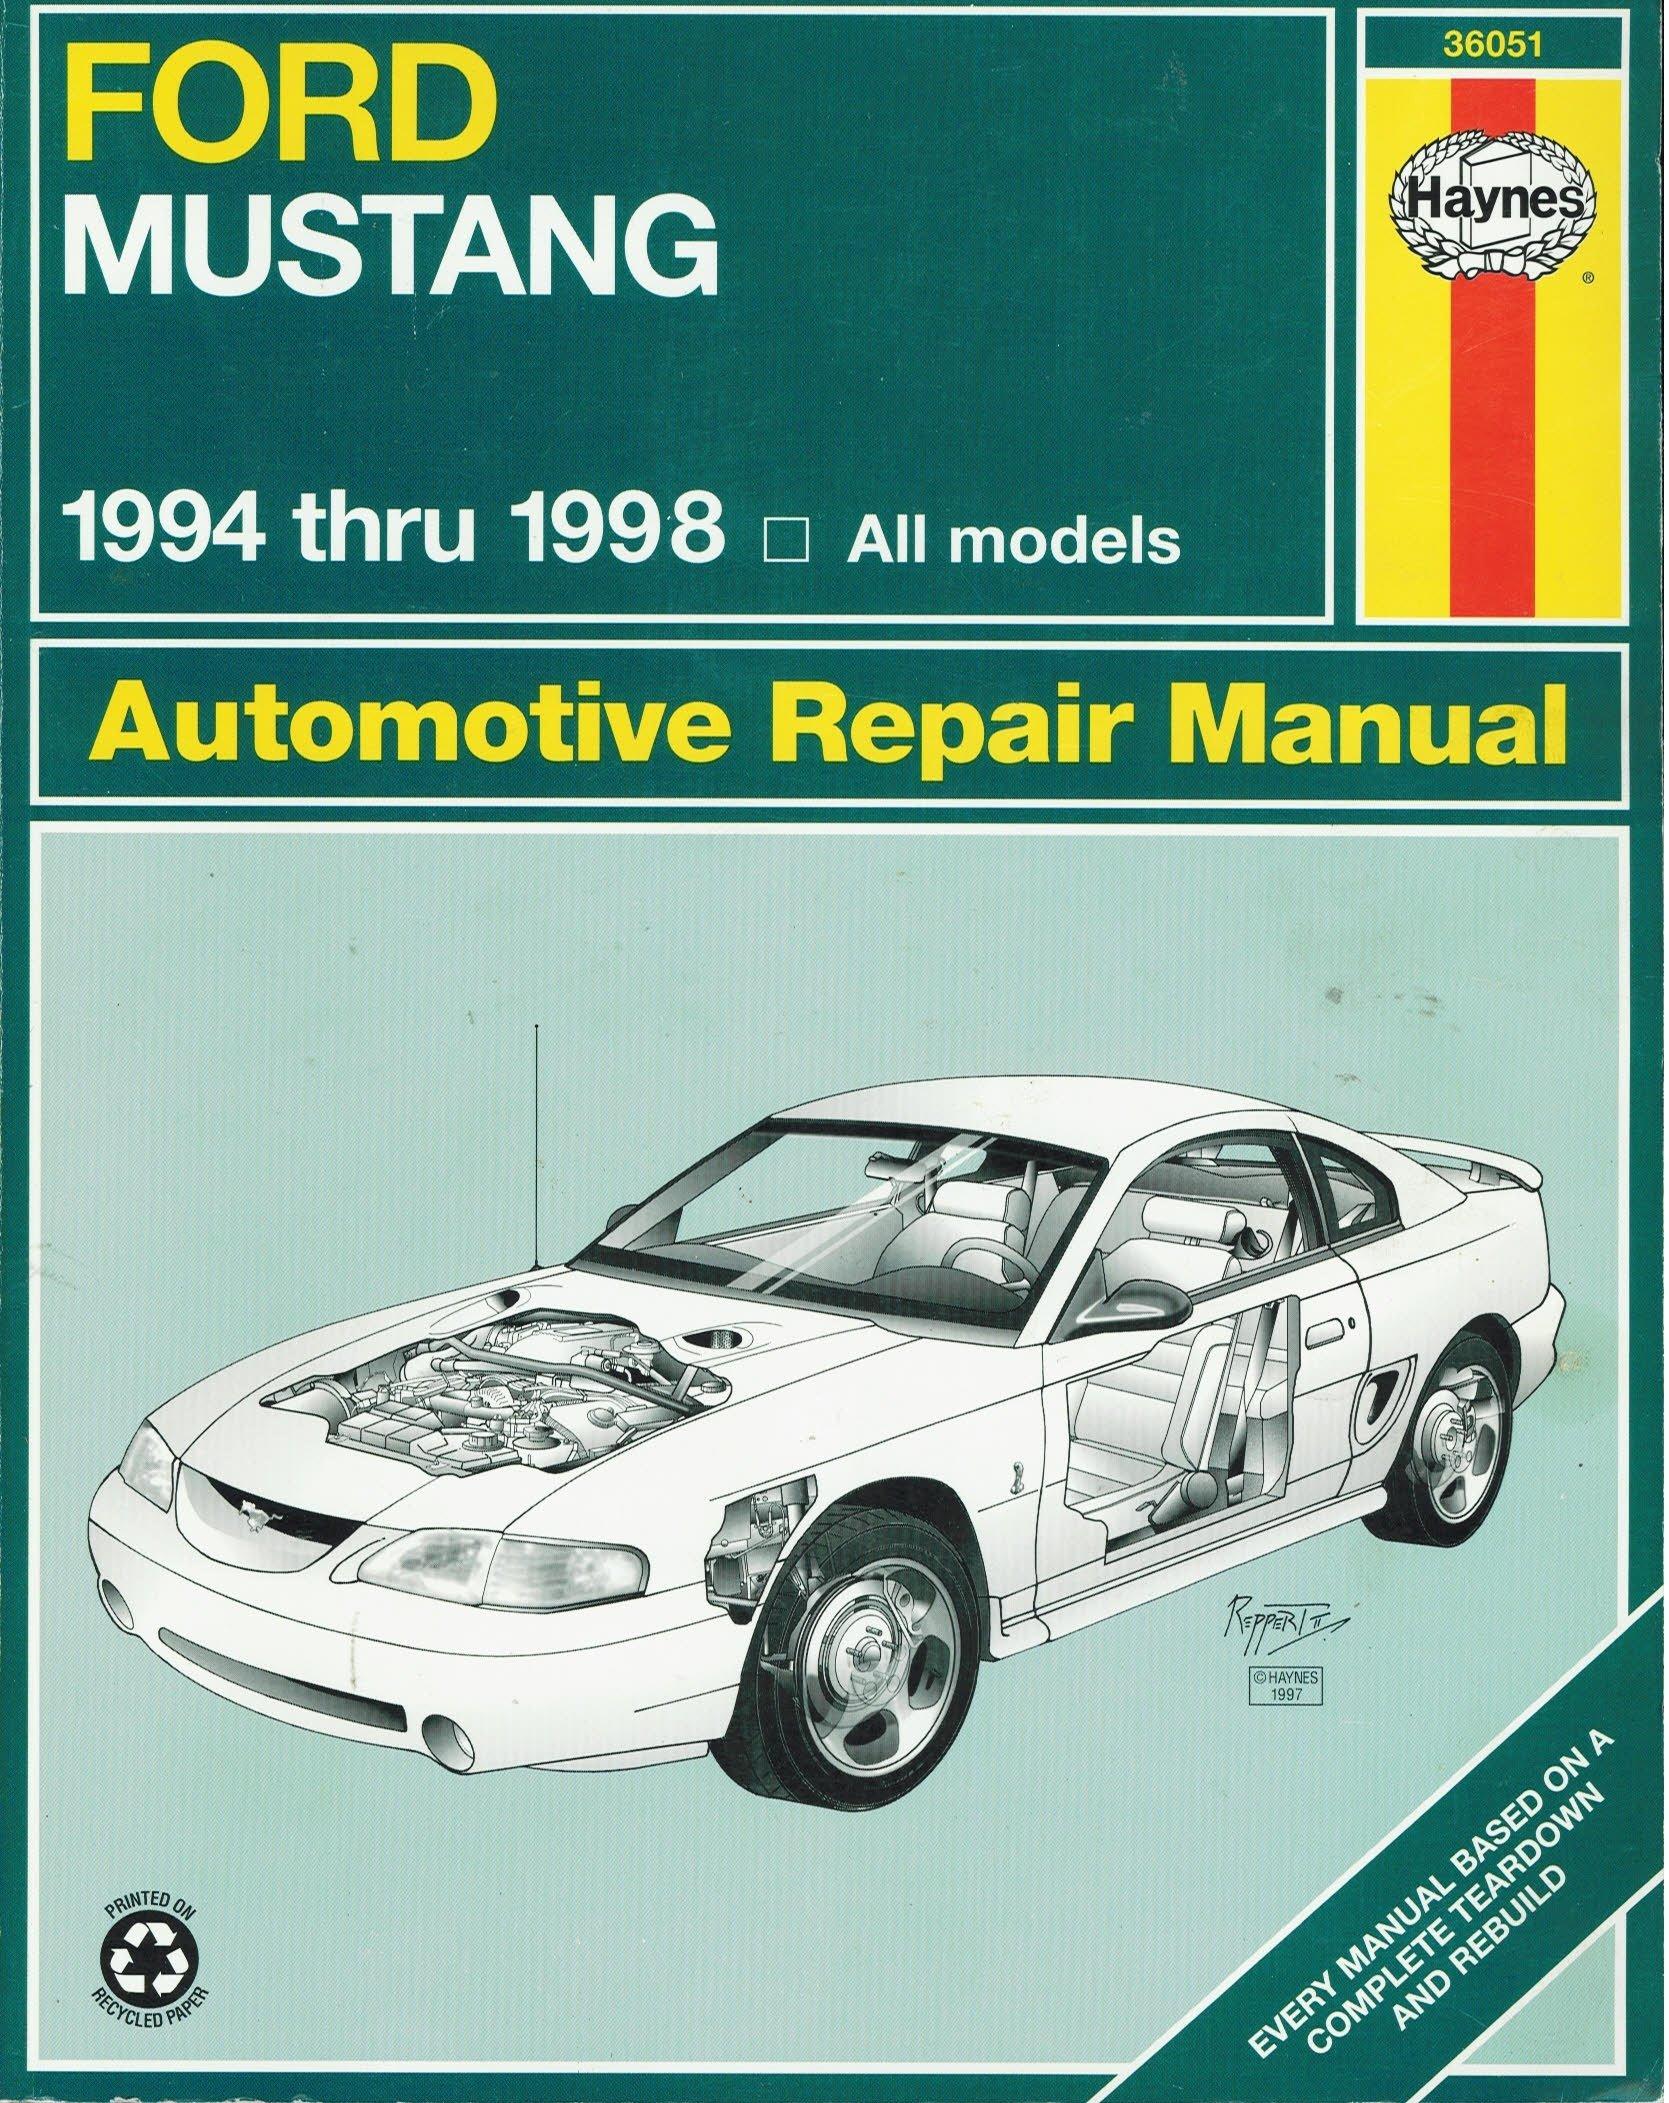 Haynes Ford Mustang: 1994 Thru 1998 (Haynes Automotive Repair Manuals):  Haynes Editors: 9781563923241: Amazon.com: Books